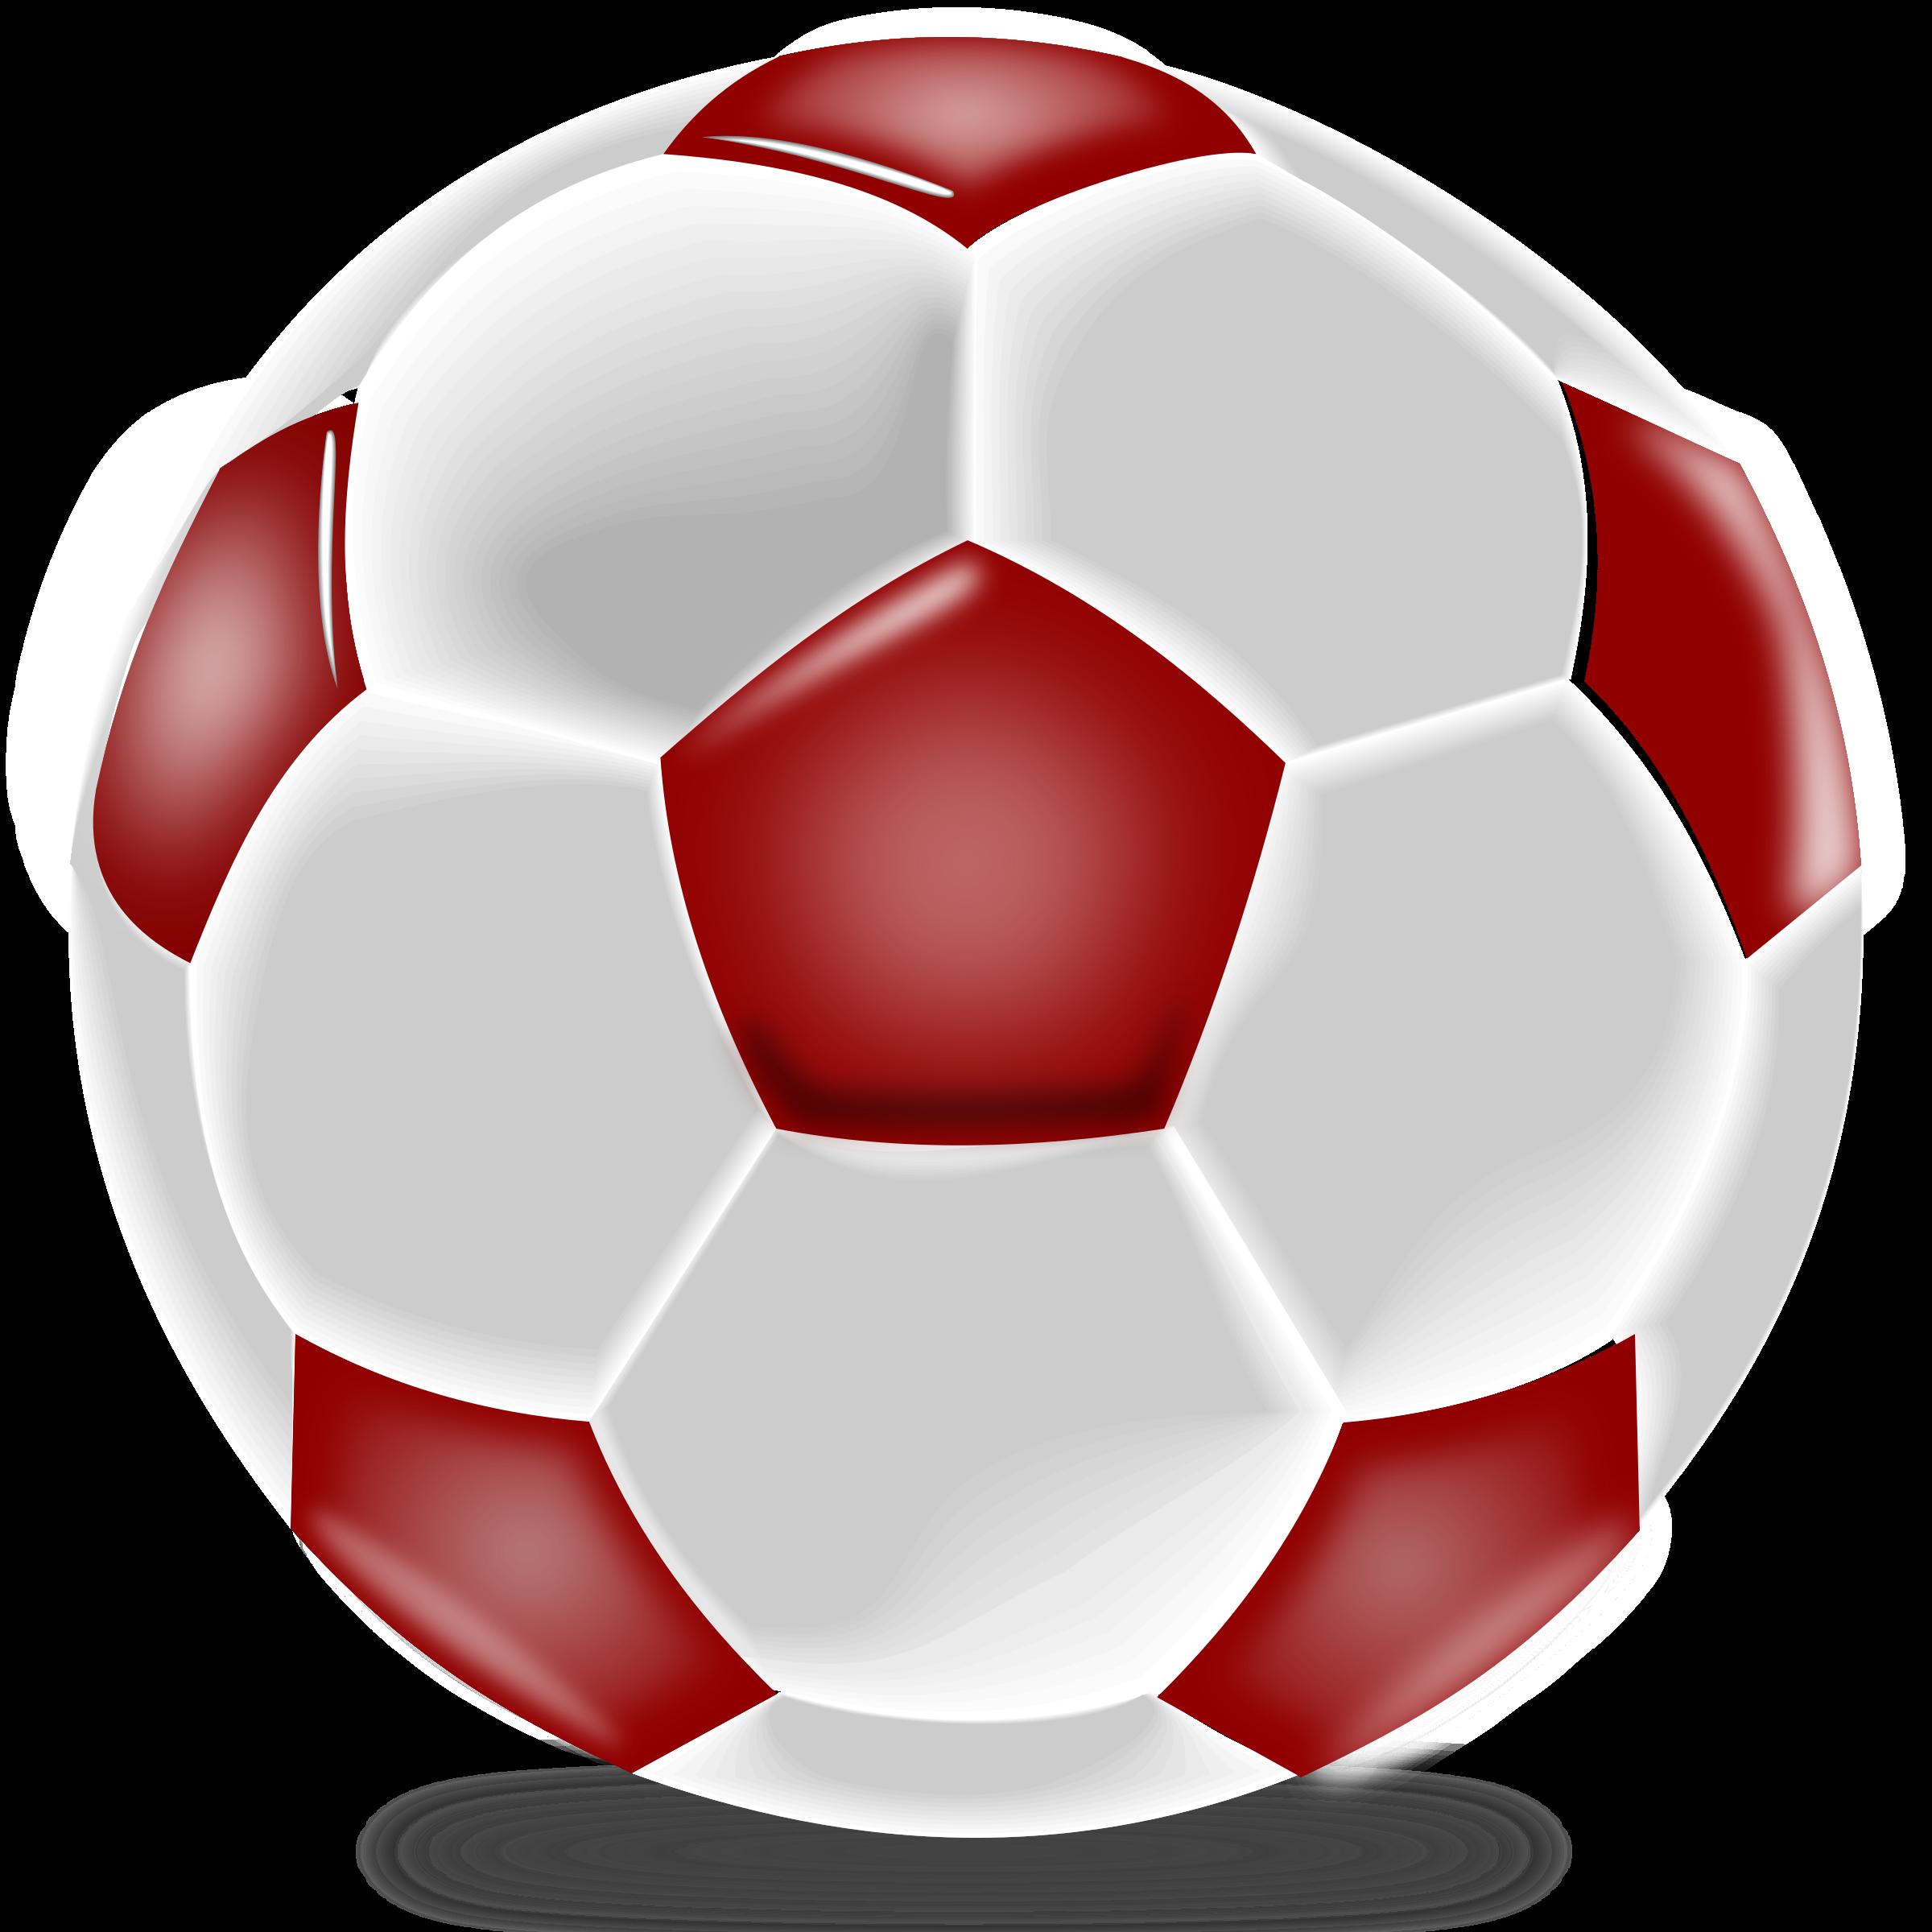 2400x2400 Realistic Clipart Soccer Ball